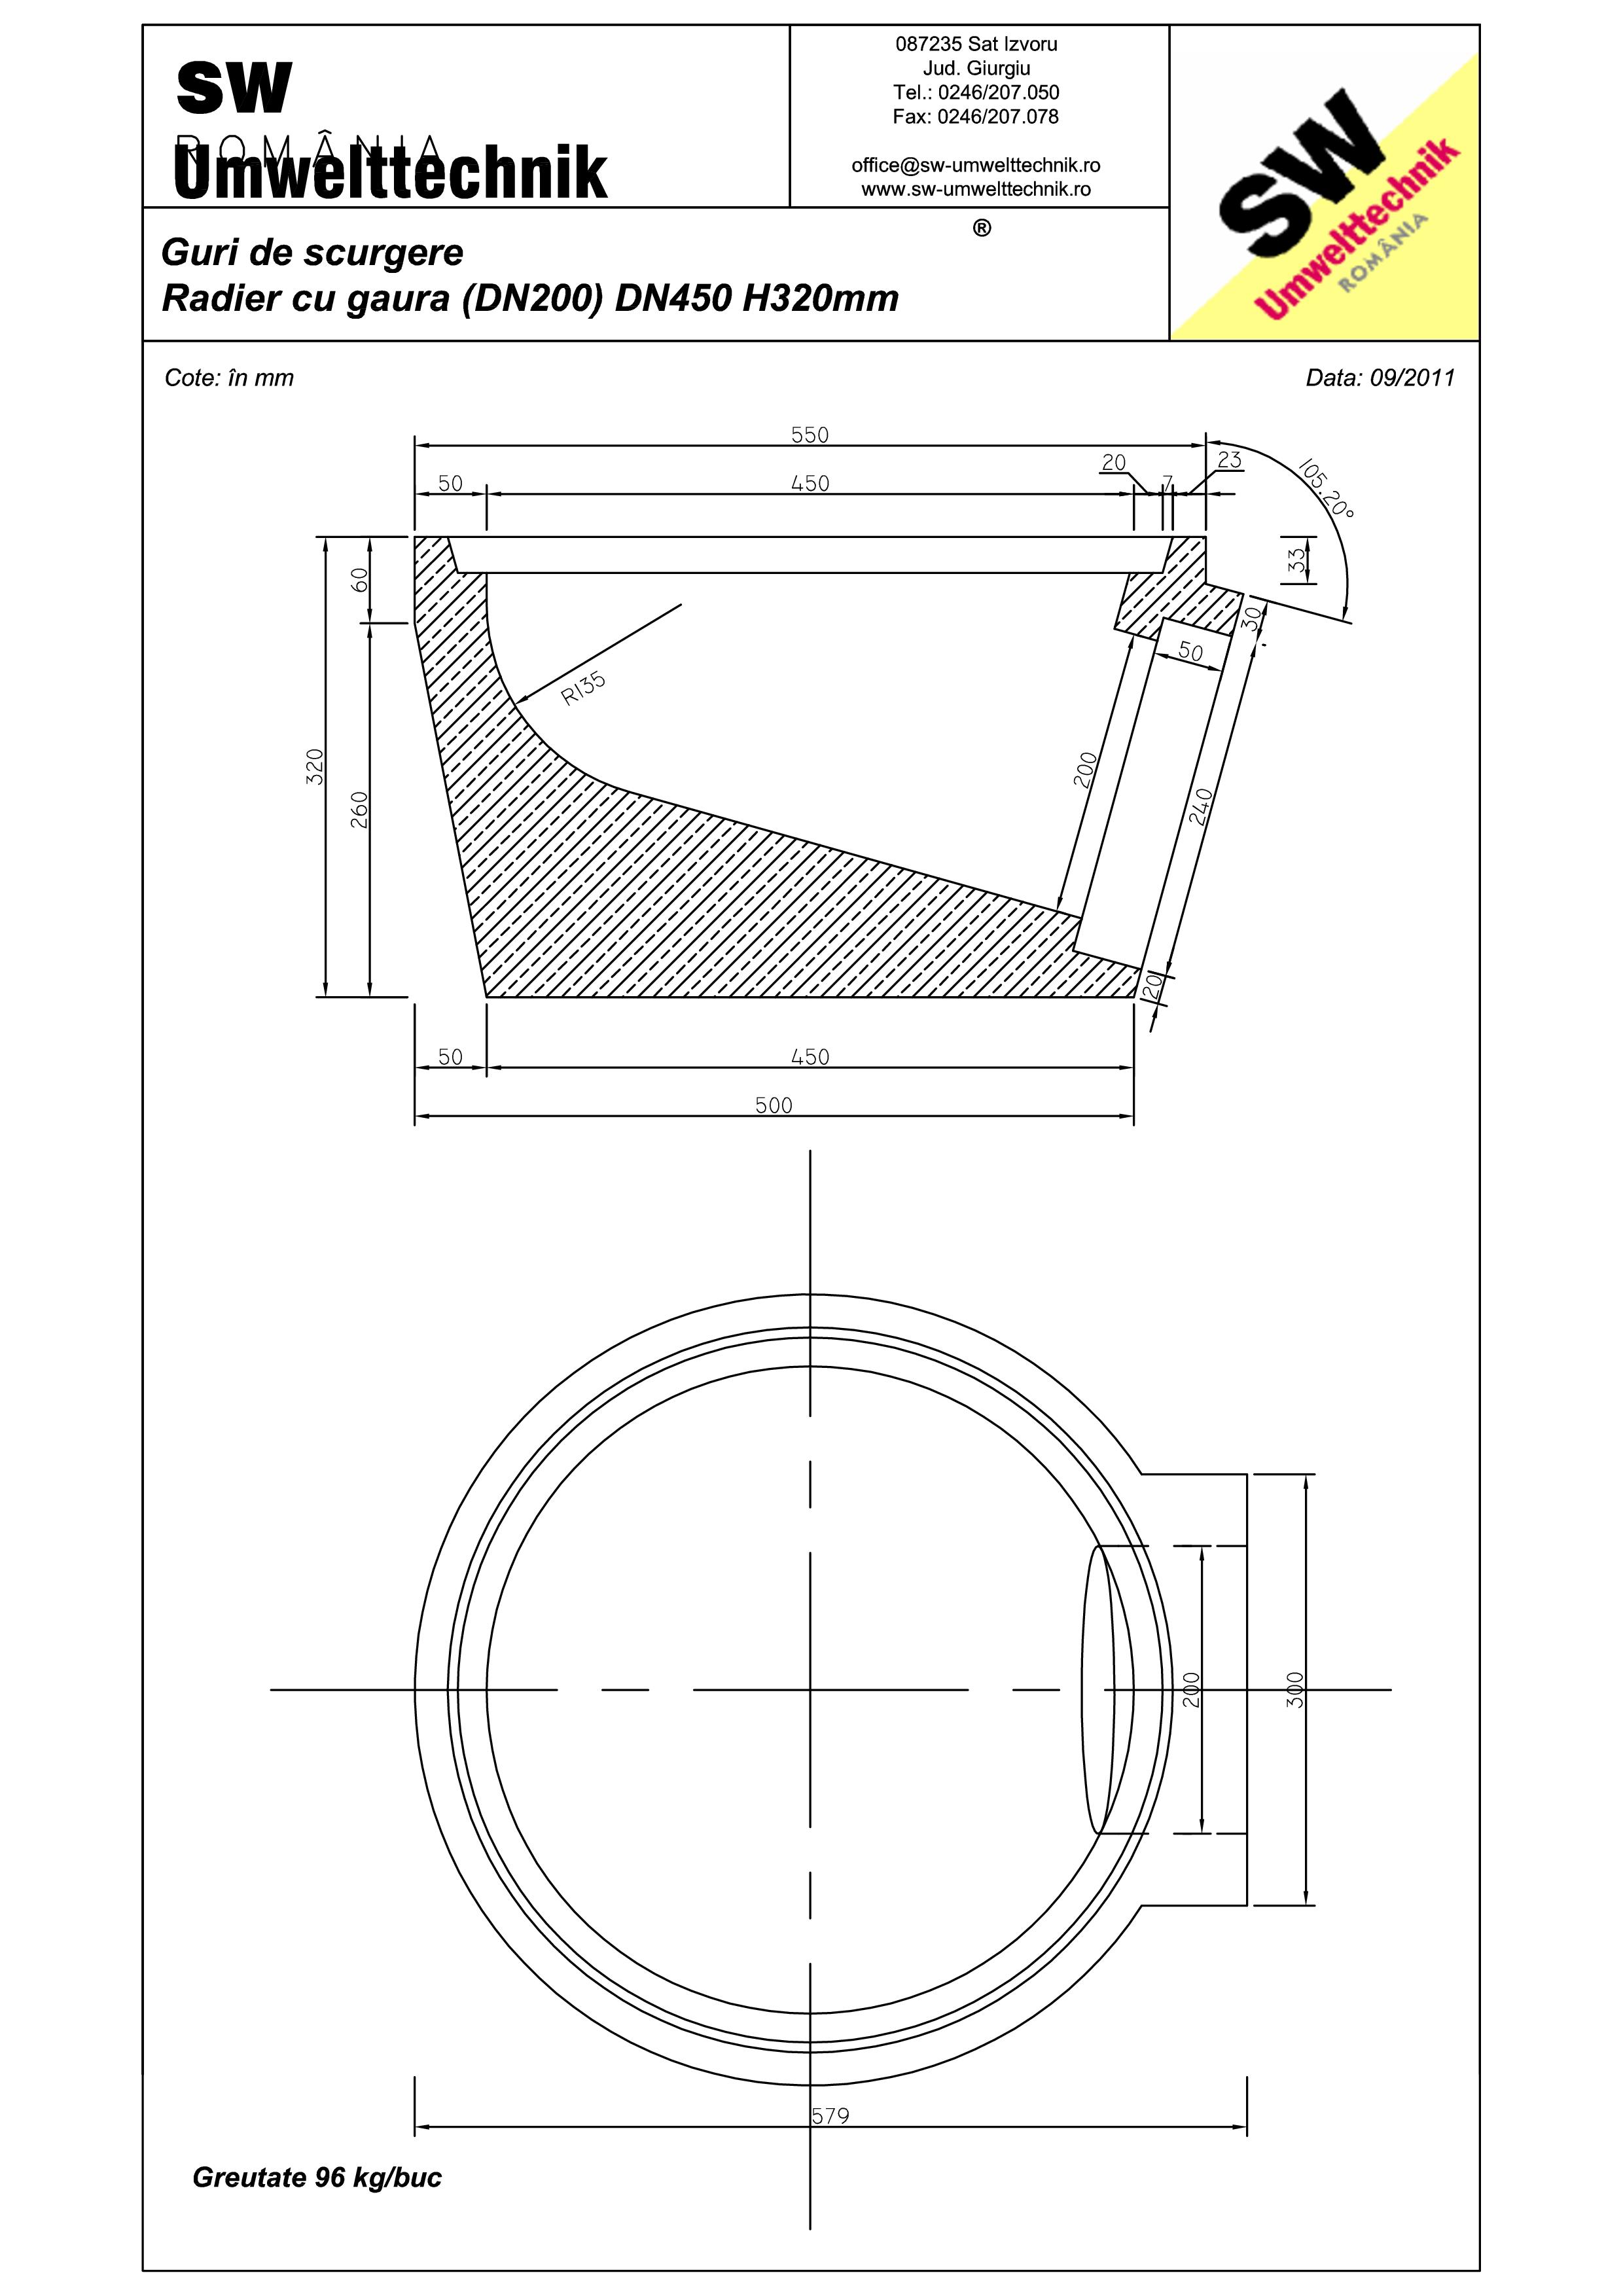 Pagina 1 - CAD-PDF Plan Austria - radier cu gaura (DN200) DN450 H320 mm SW UMWELTTECHNIK Detaliu de ...